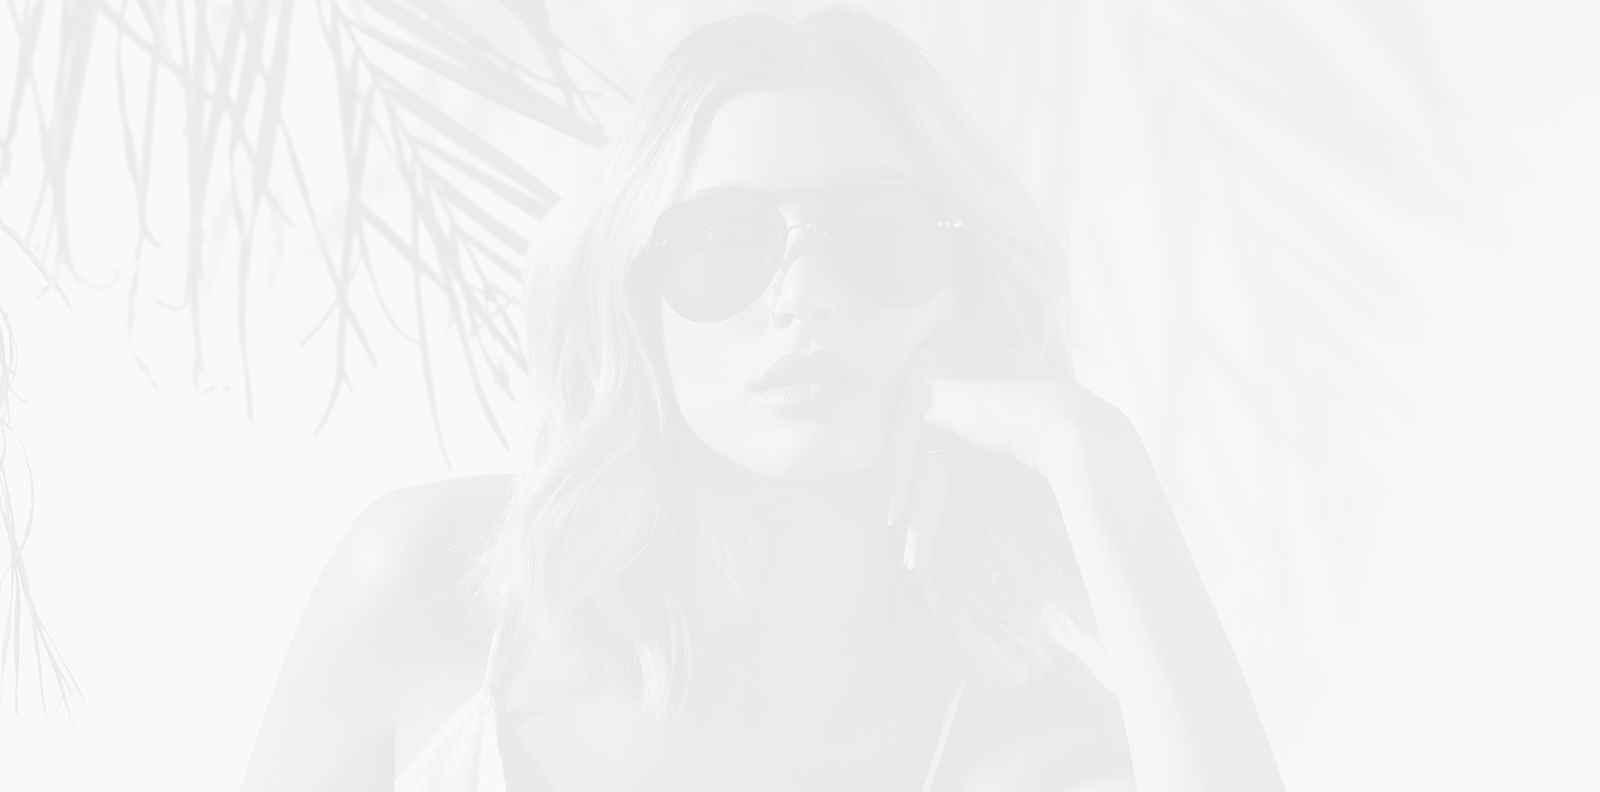 Хейли Бийбър щурмува YouTube със собствен канал